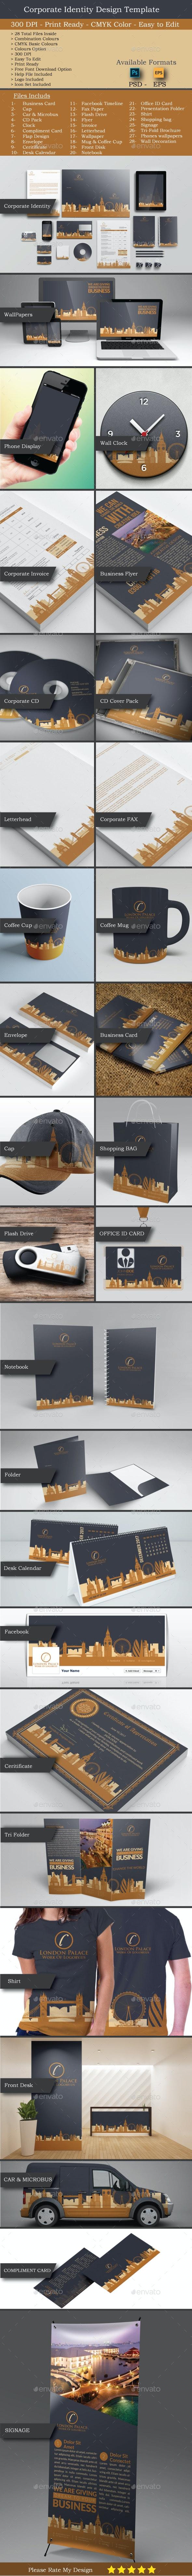 Modern Real Estate Identity Set - Stationery Print Templates